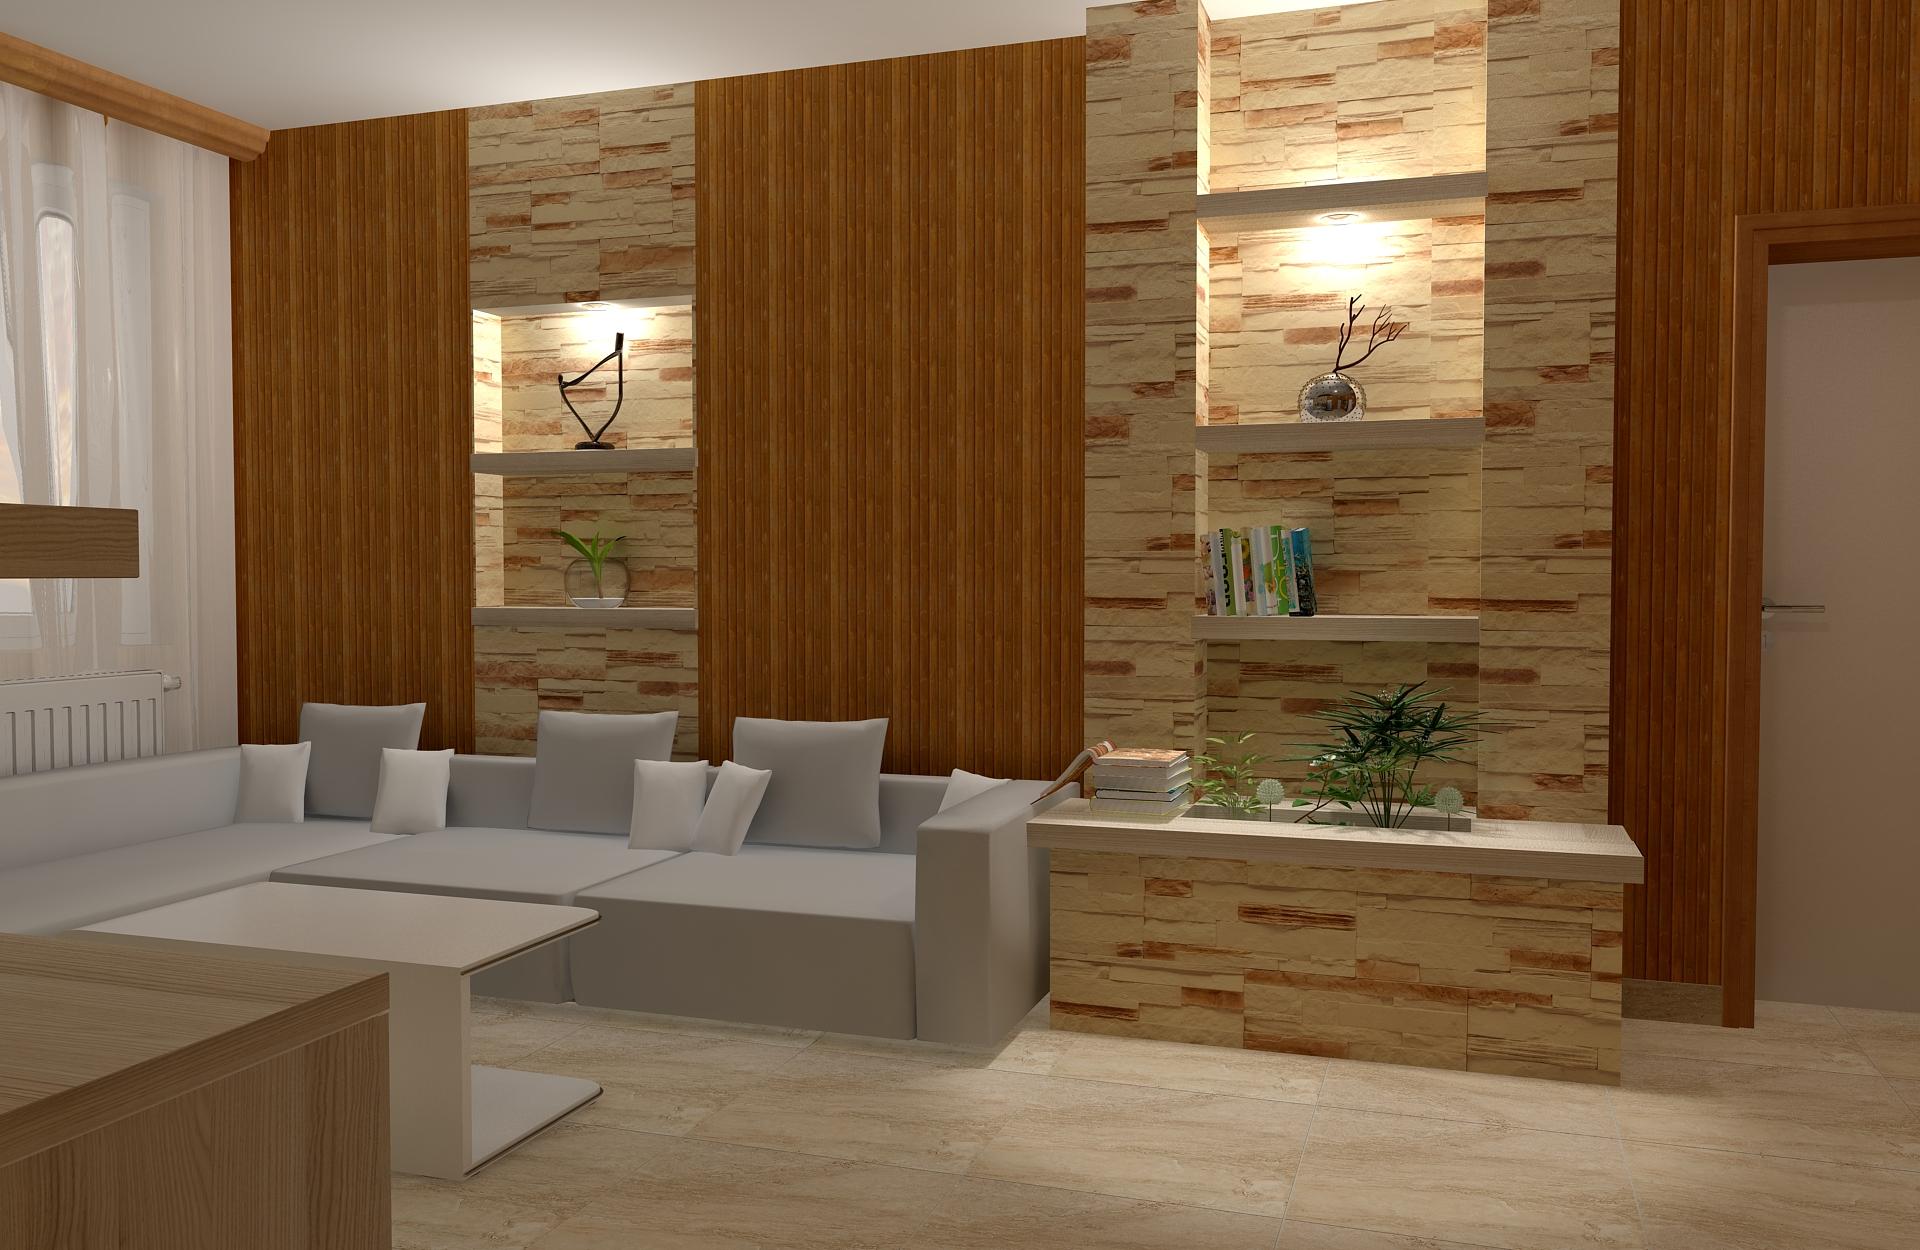 fabro stone bathroom by sz p otthon p pa on visoft360 portal. Black Bedroom Furniture Sets. Home Design Ideas